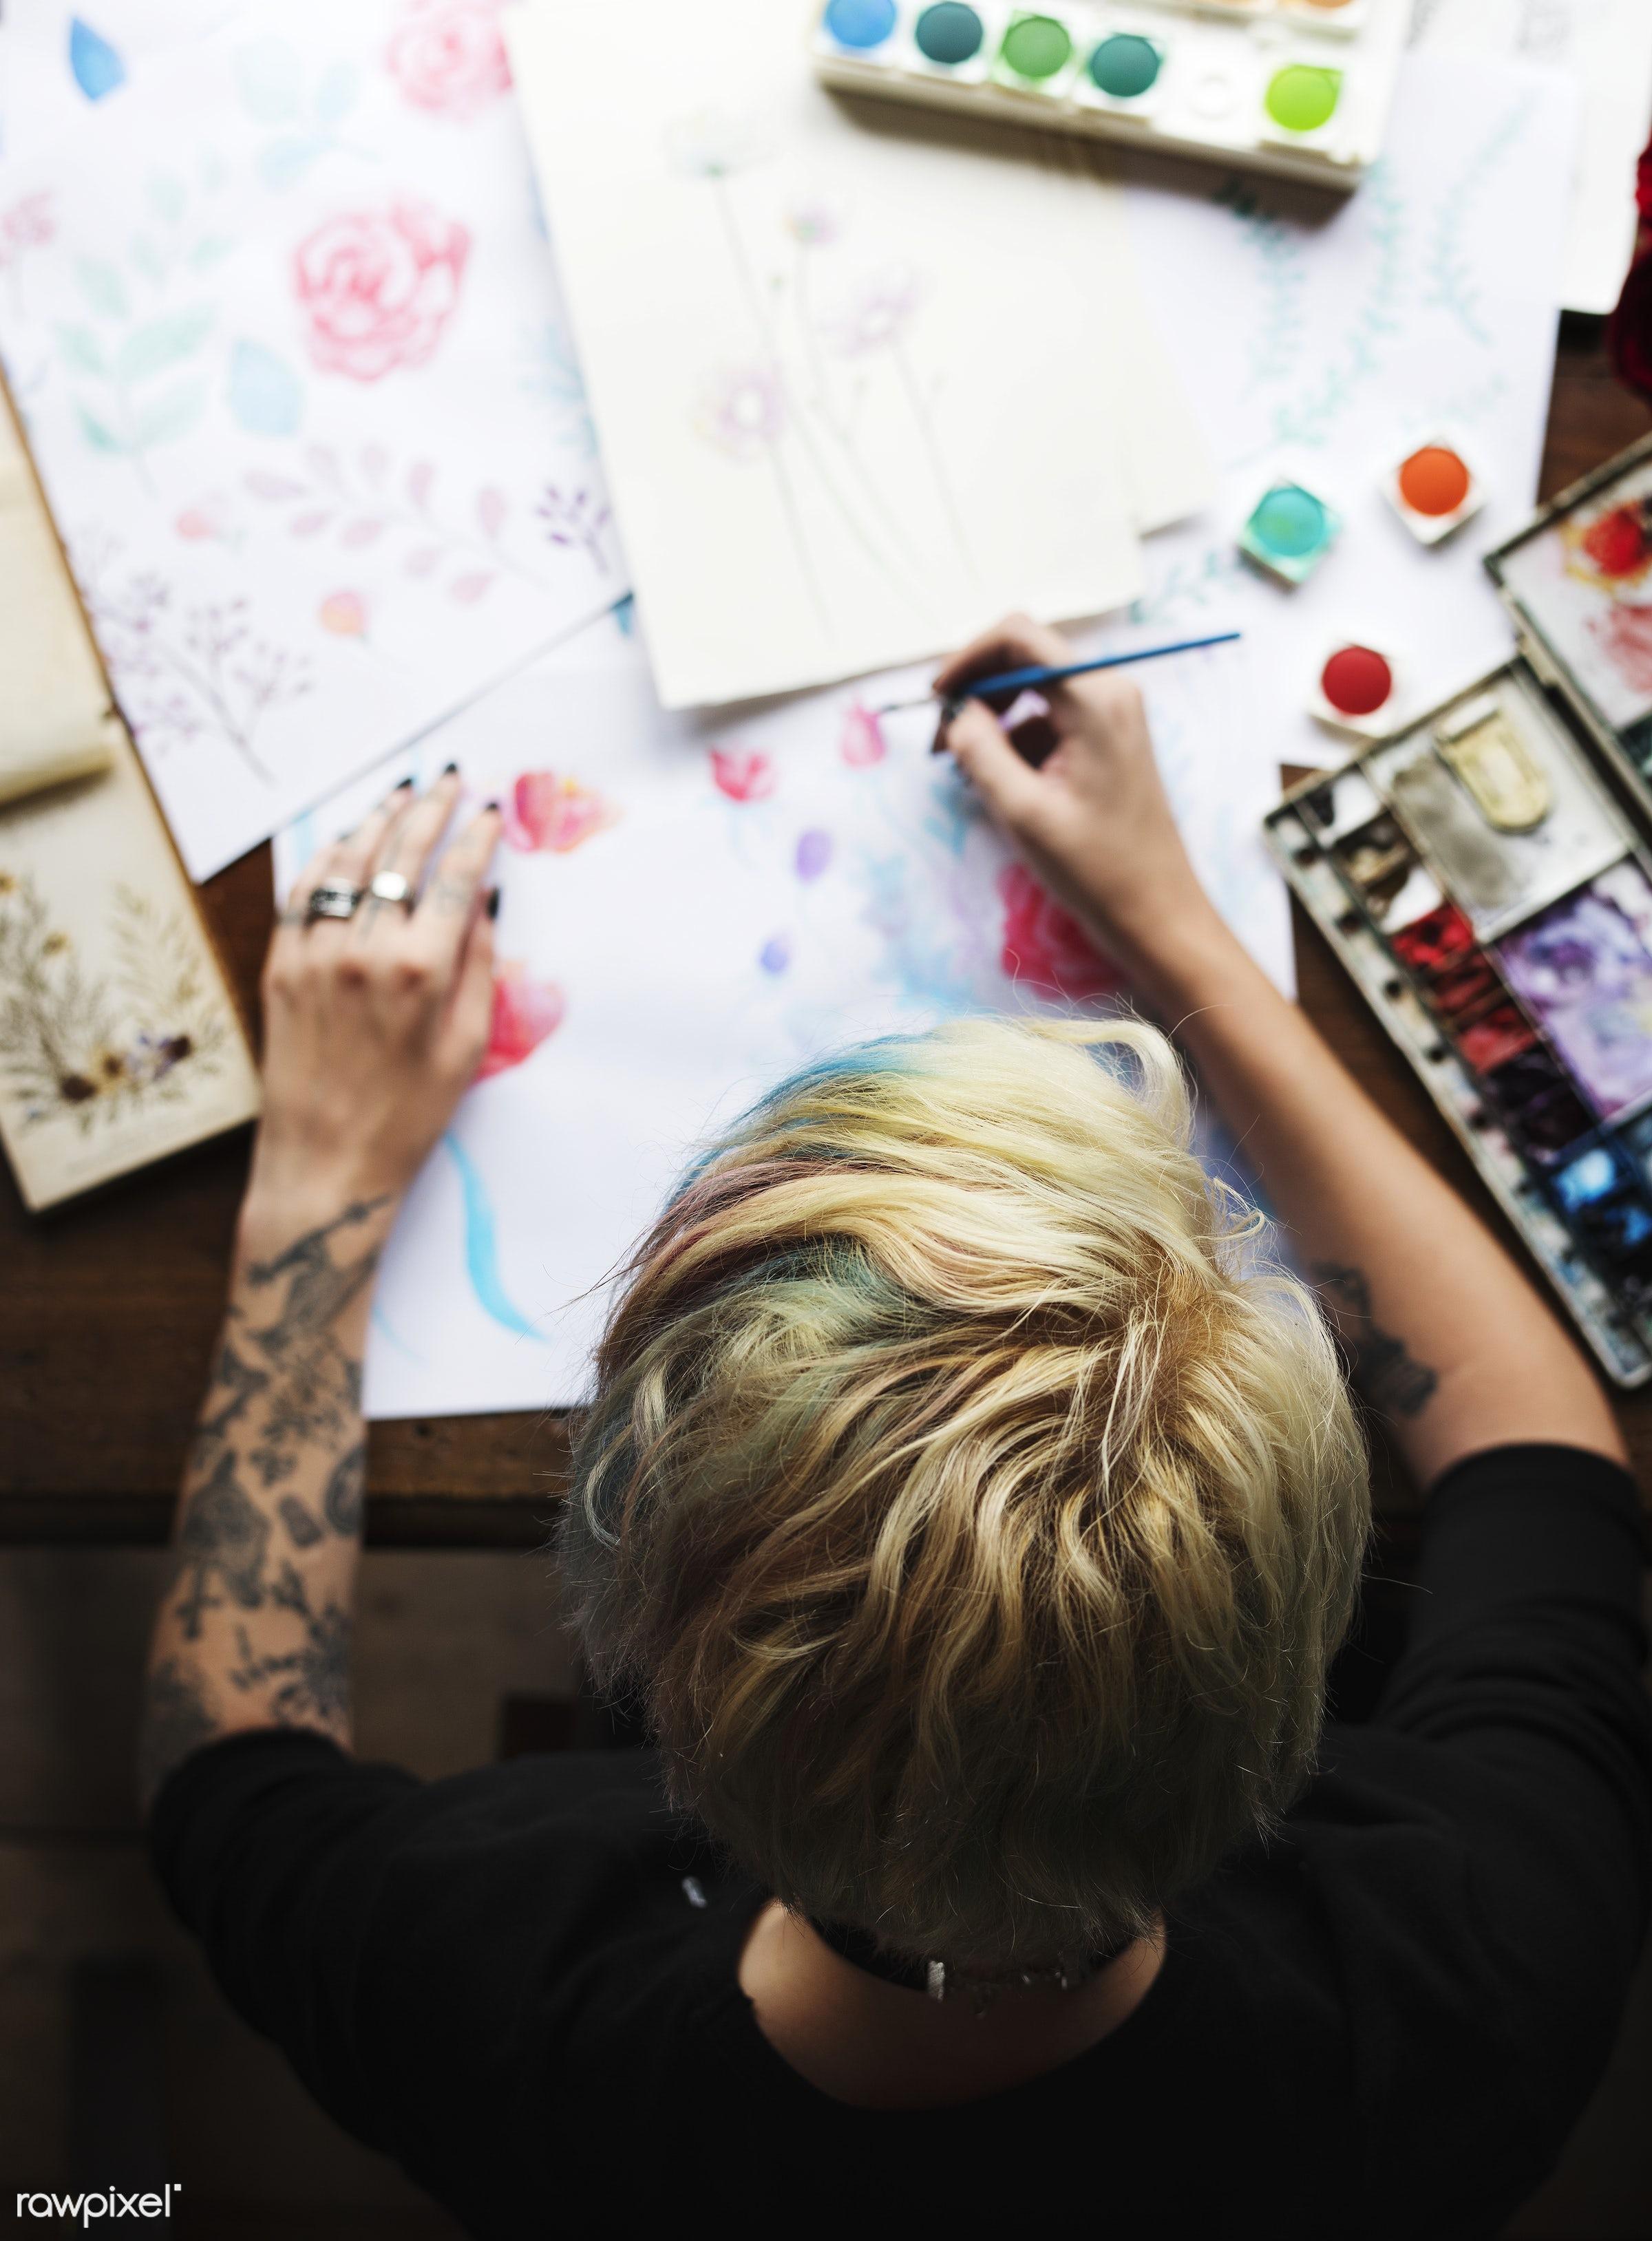 craft, person, arts, relax, handicraft, tool, palette, paintbrush, equipment, creativity, people, draw, hands, woman,...